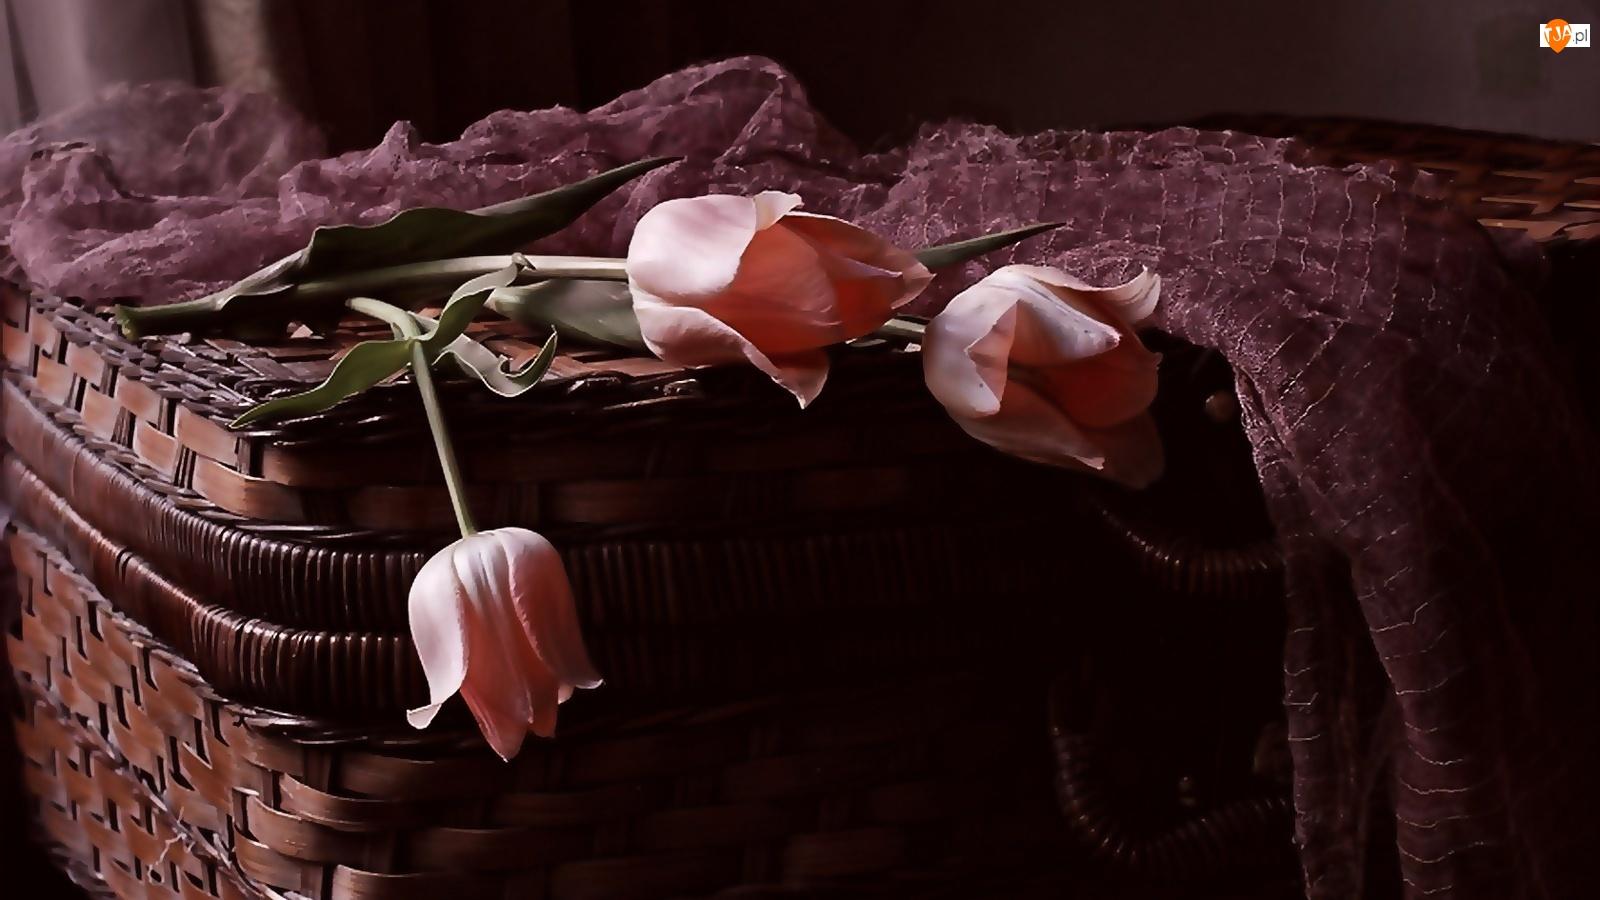 Szal, Kosz, Tulipany